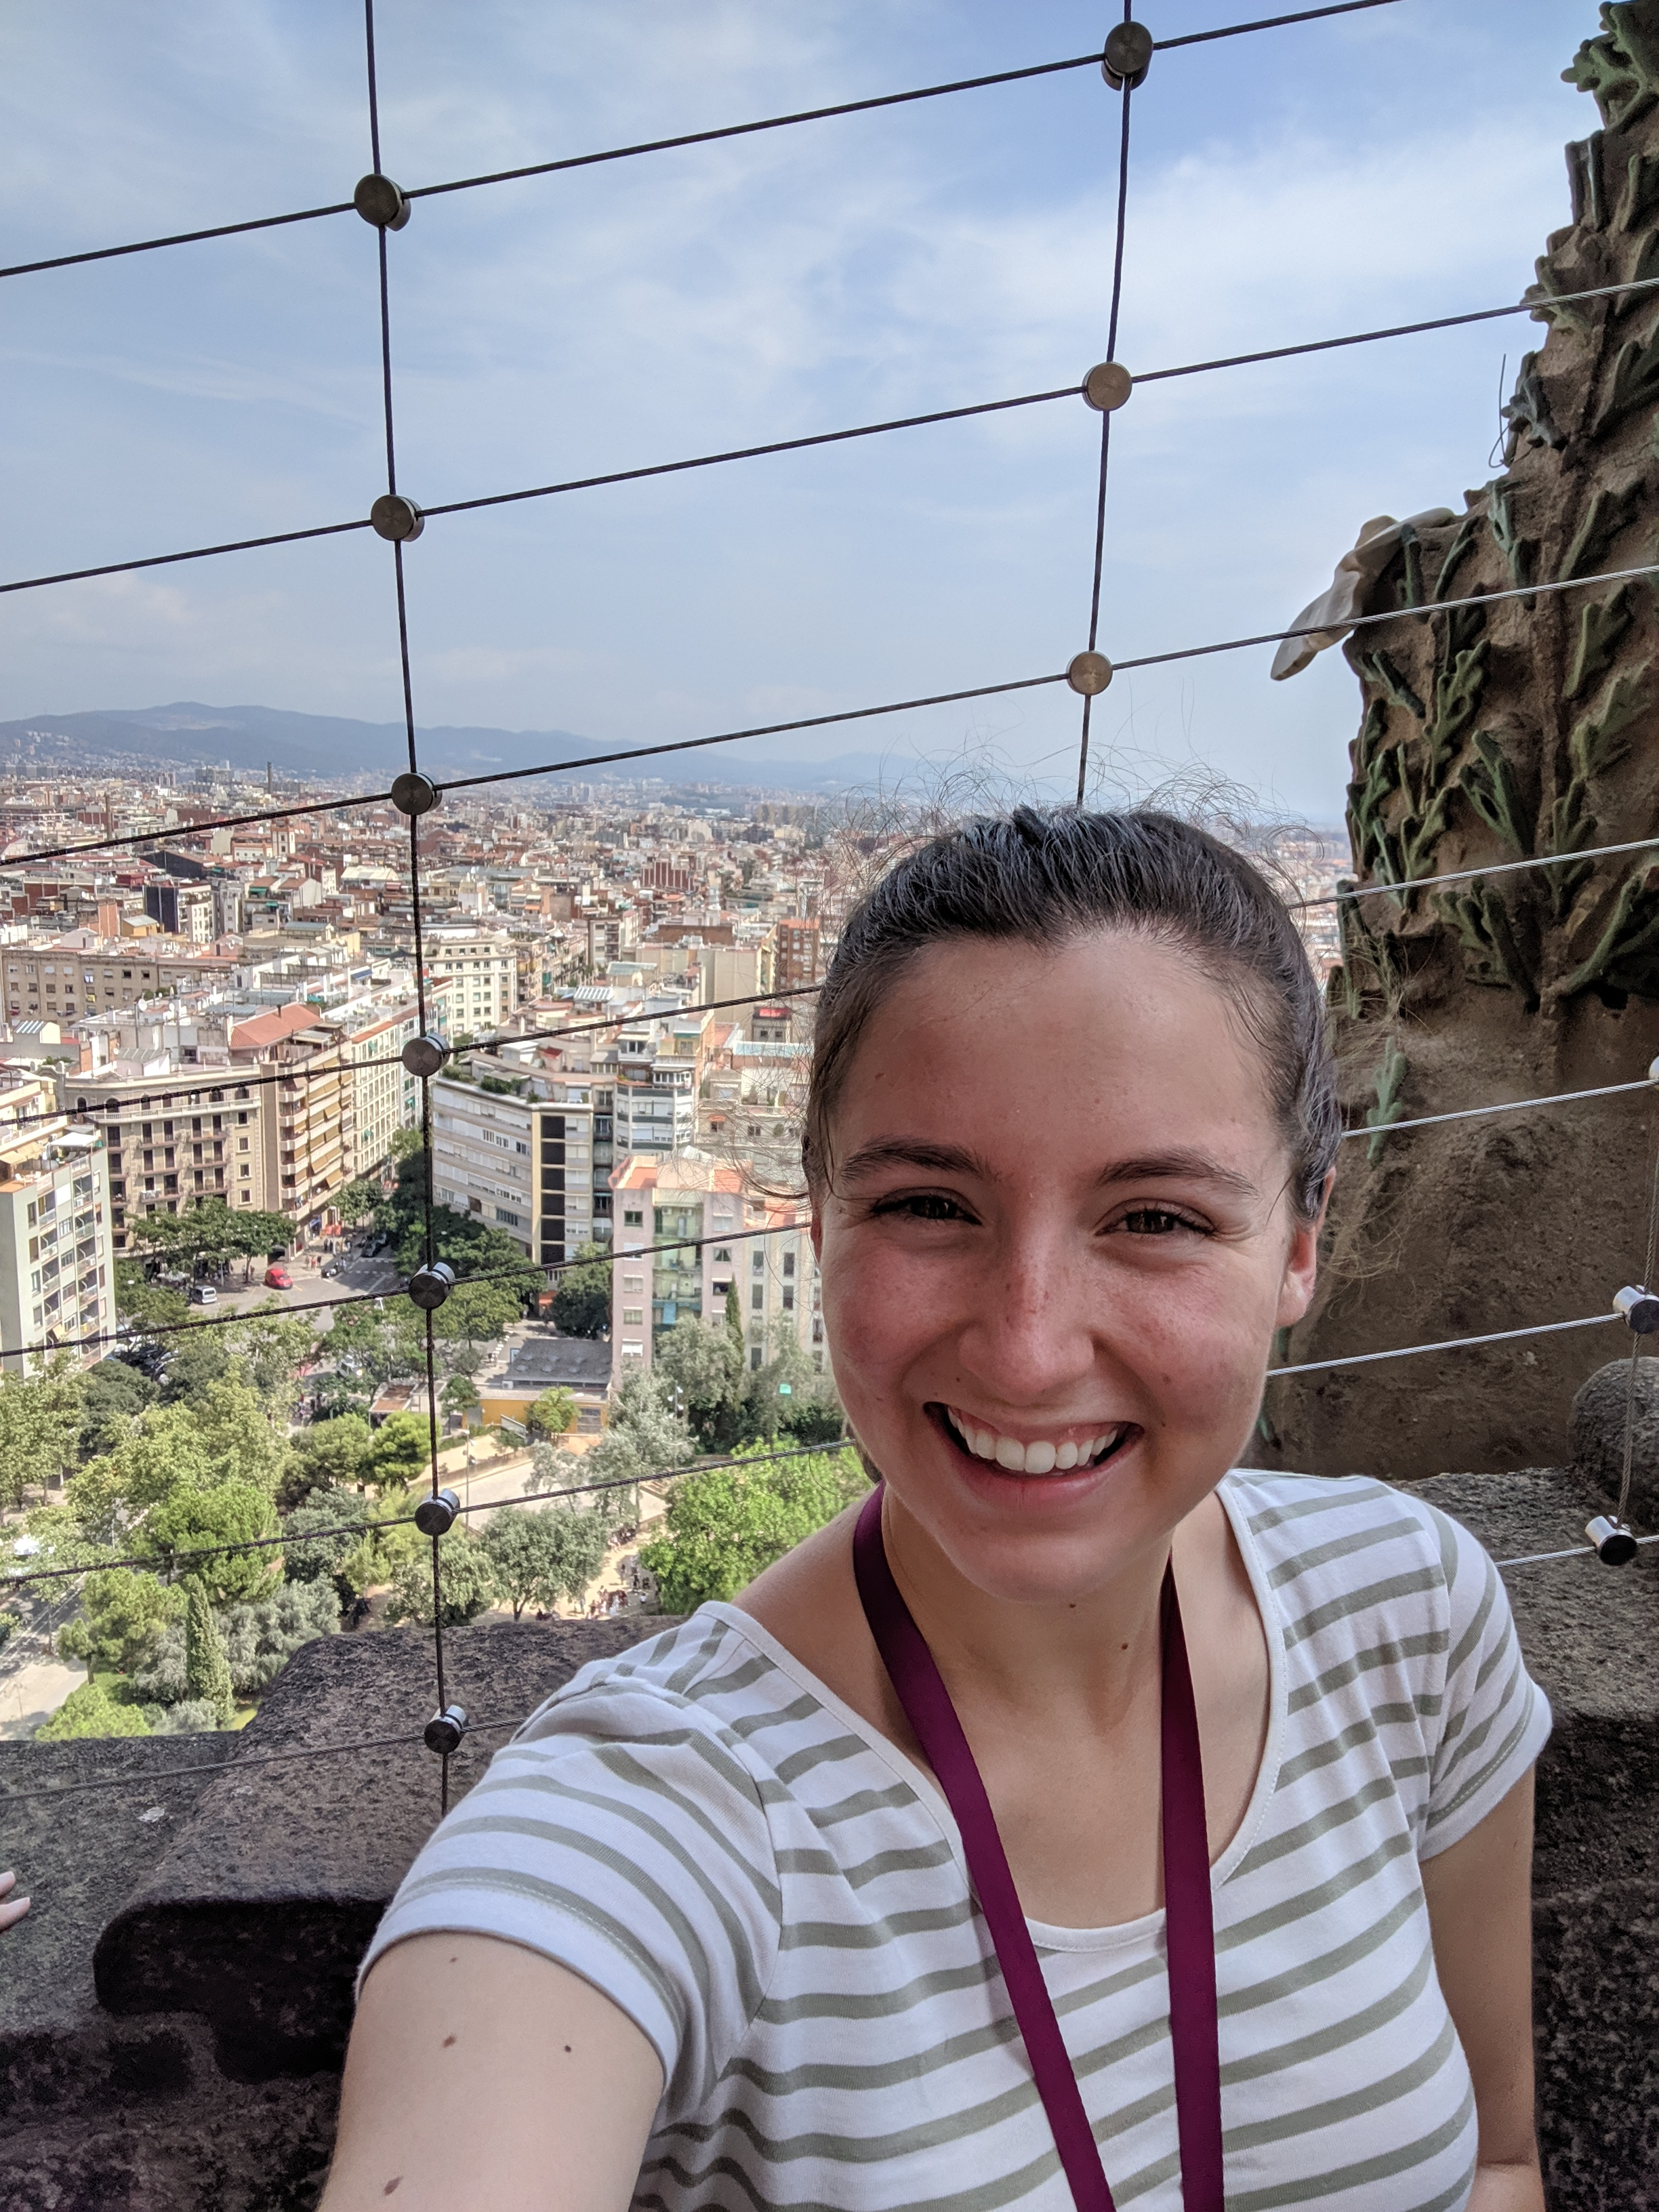 Barcelona, Sagrada familia, striped tee,